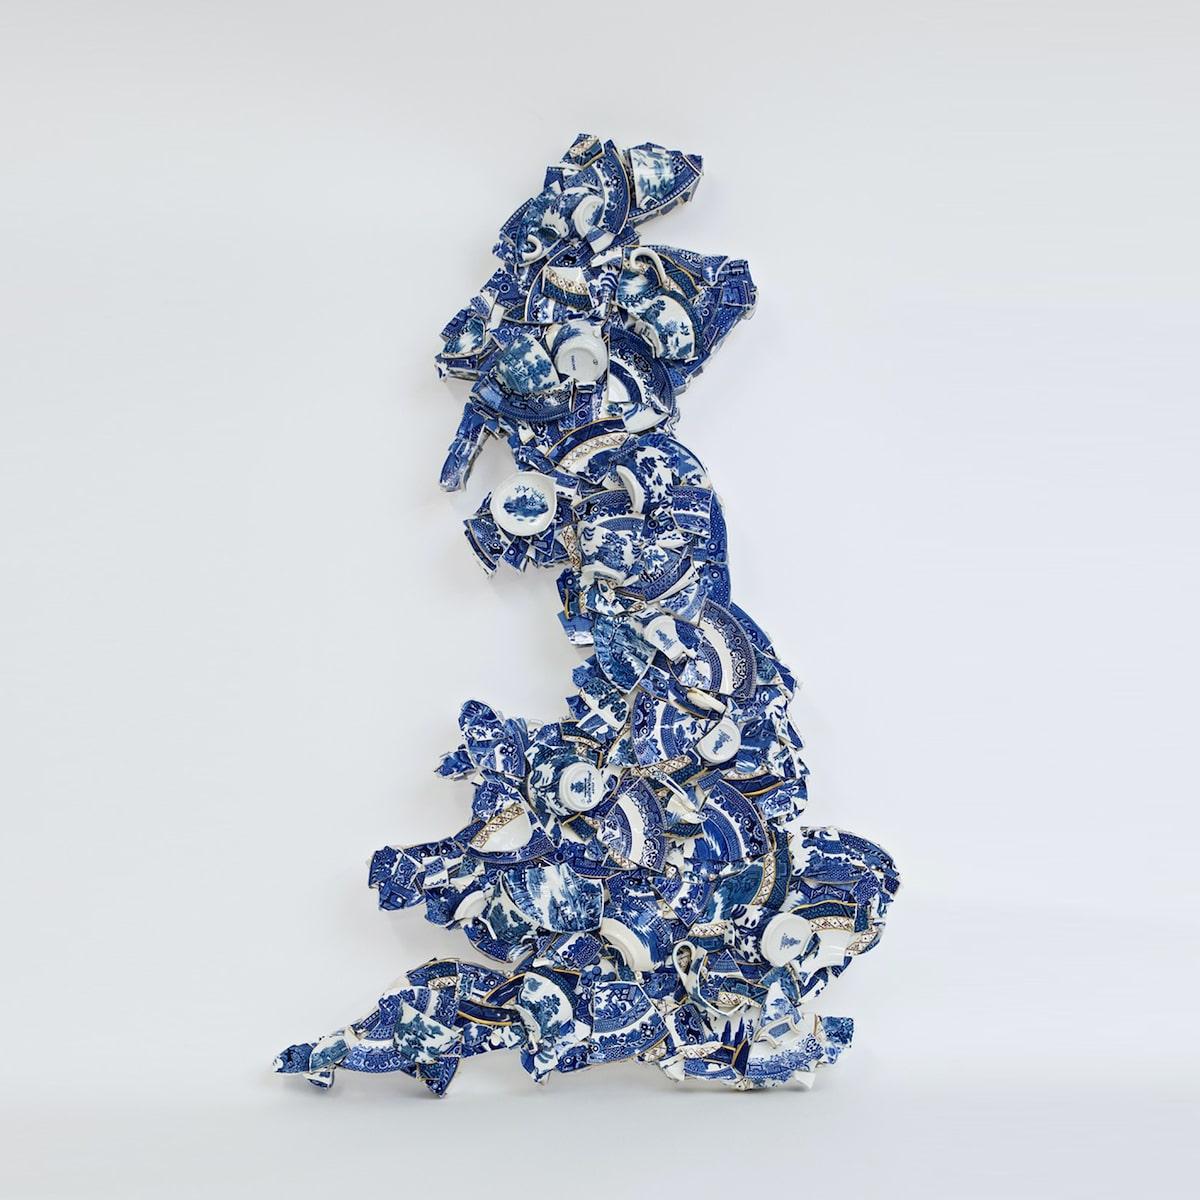 Bouke de Vries Homeland Britain II Fragmented Earthenware Sculpture